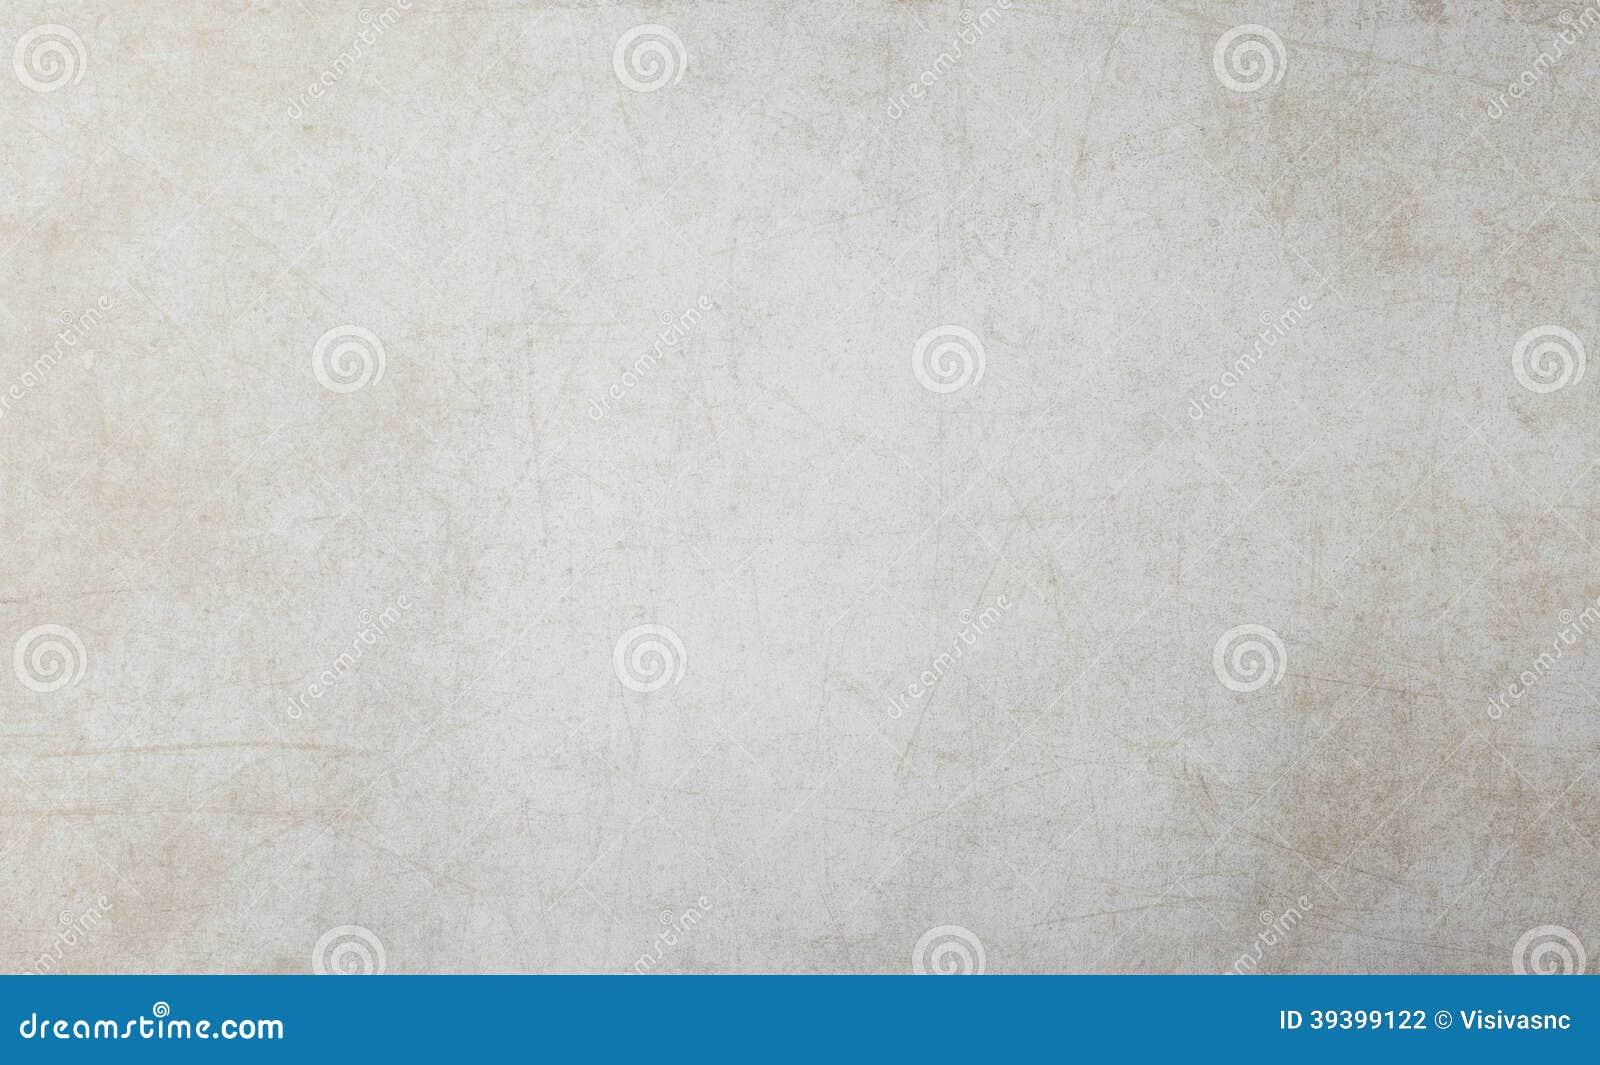 Fondo de m rmol de la textura de la teja foto de archivo for Marmol gris textura